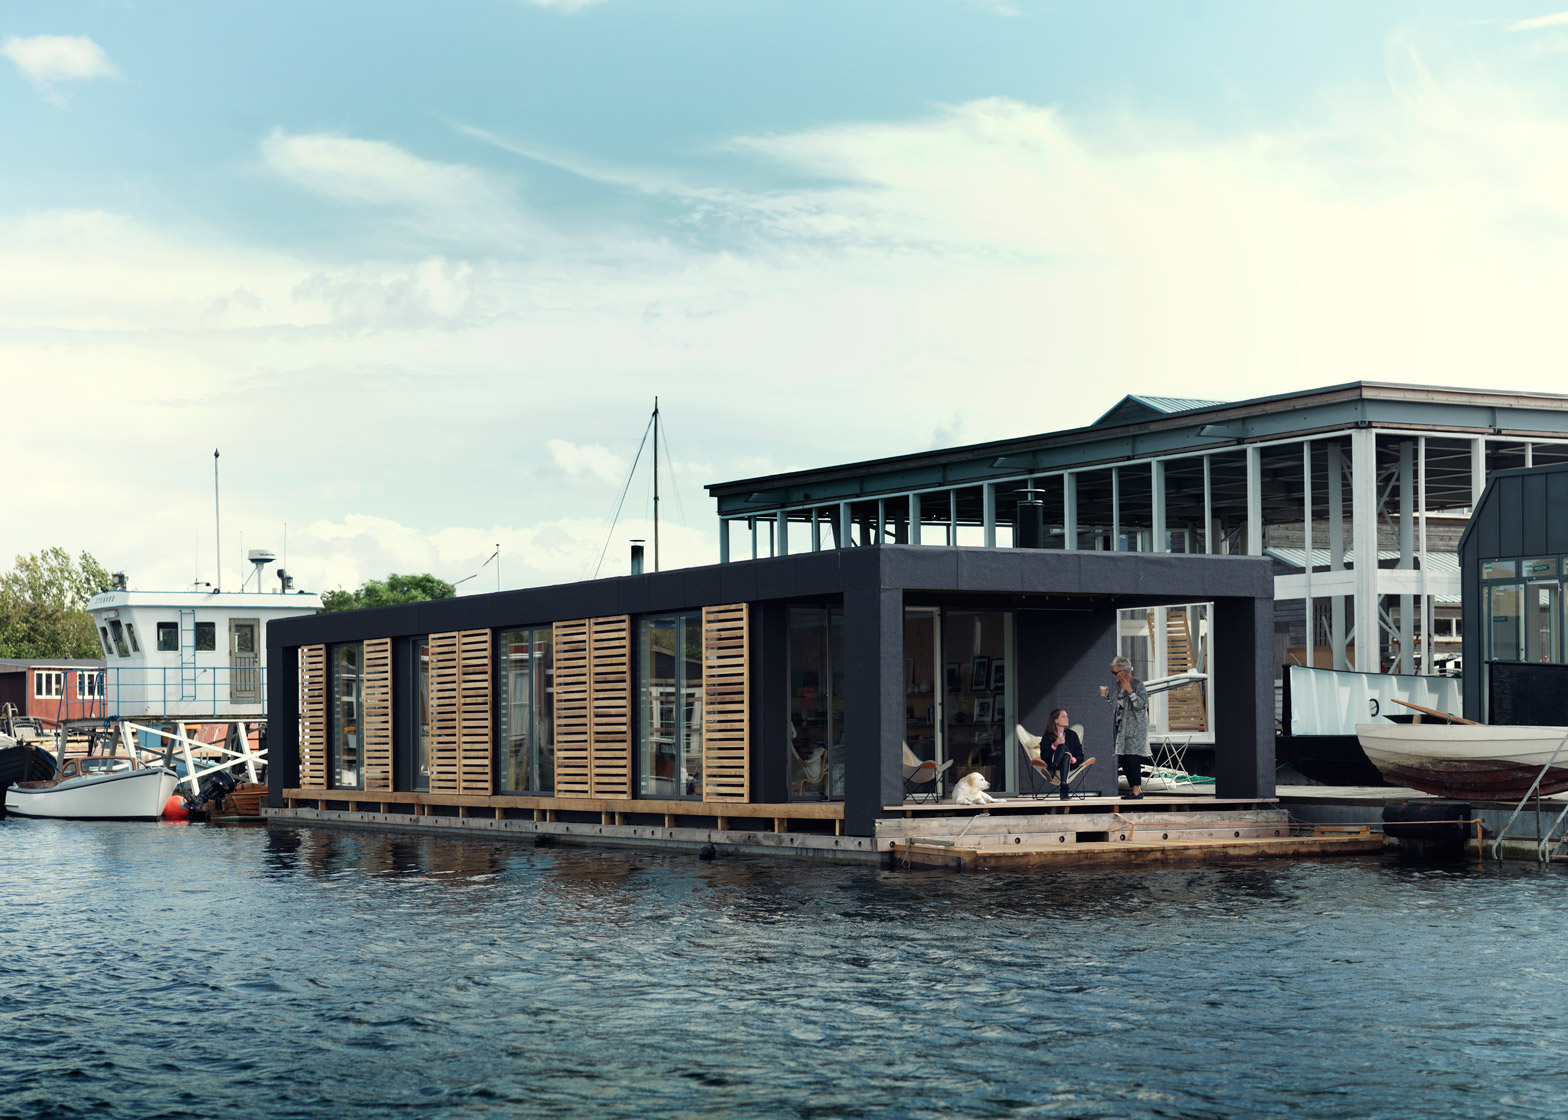 Houseboat Images Houseboat By Laust Nargaard Floats In Copenhagen Harbour